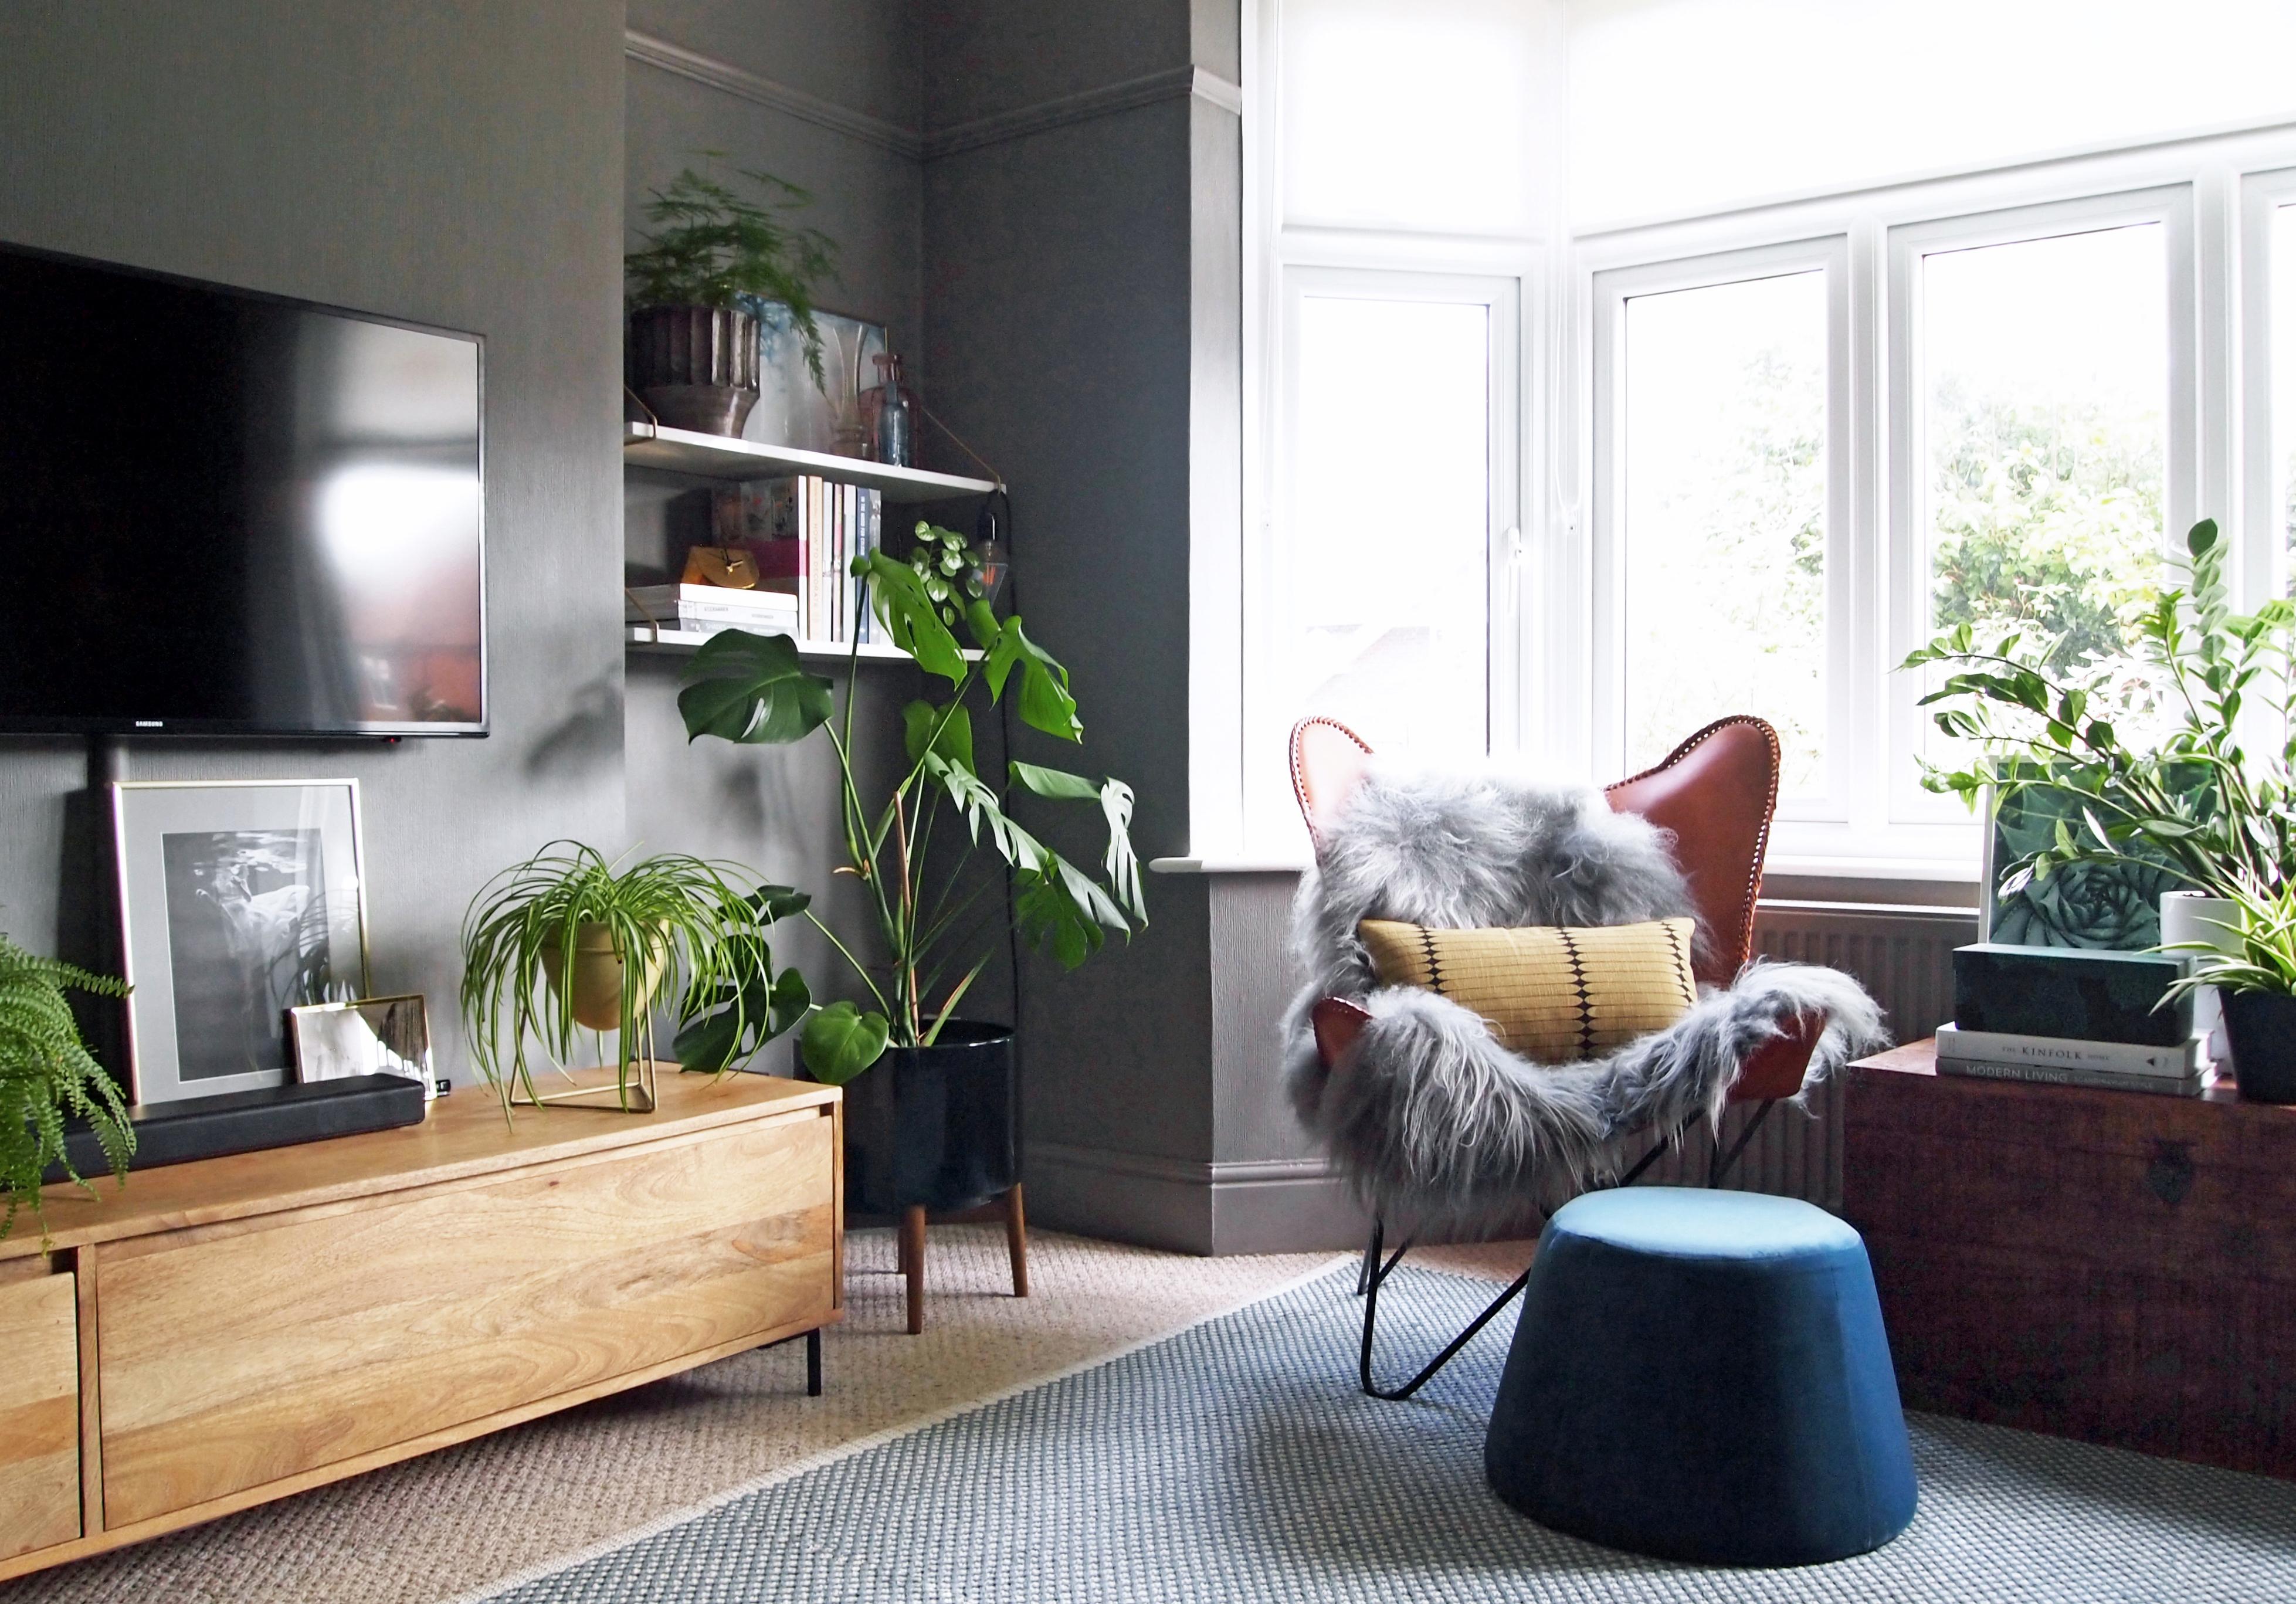 Home Living rev restyle reveal my living room reveal sense